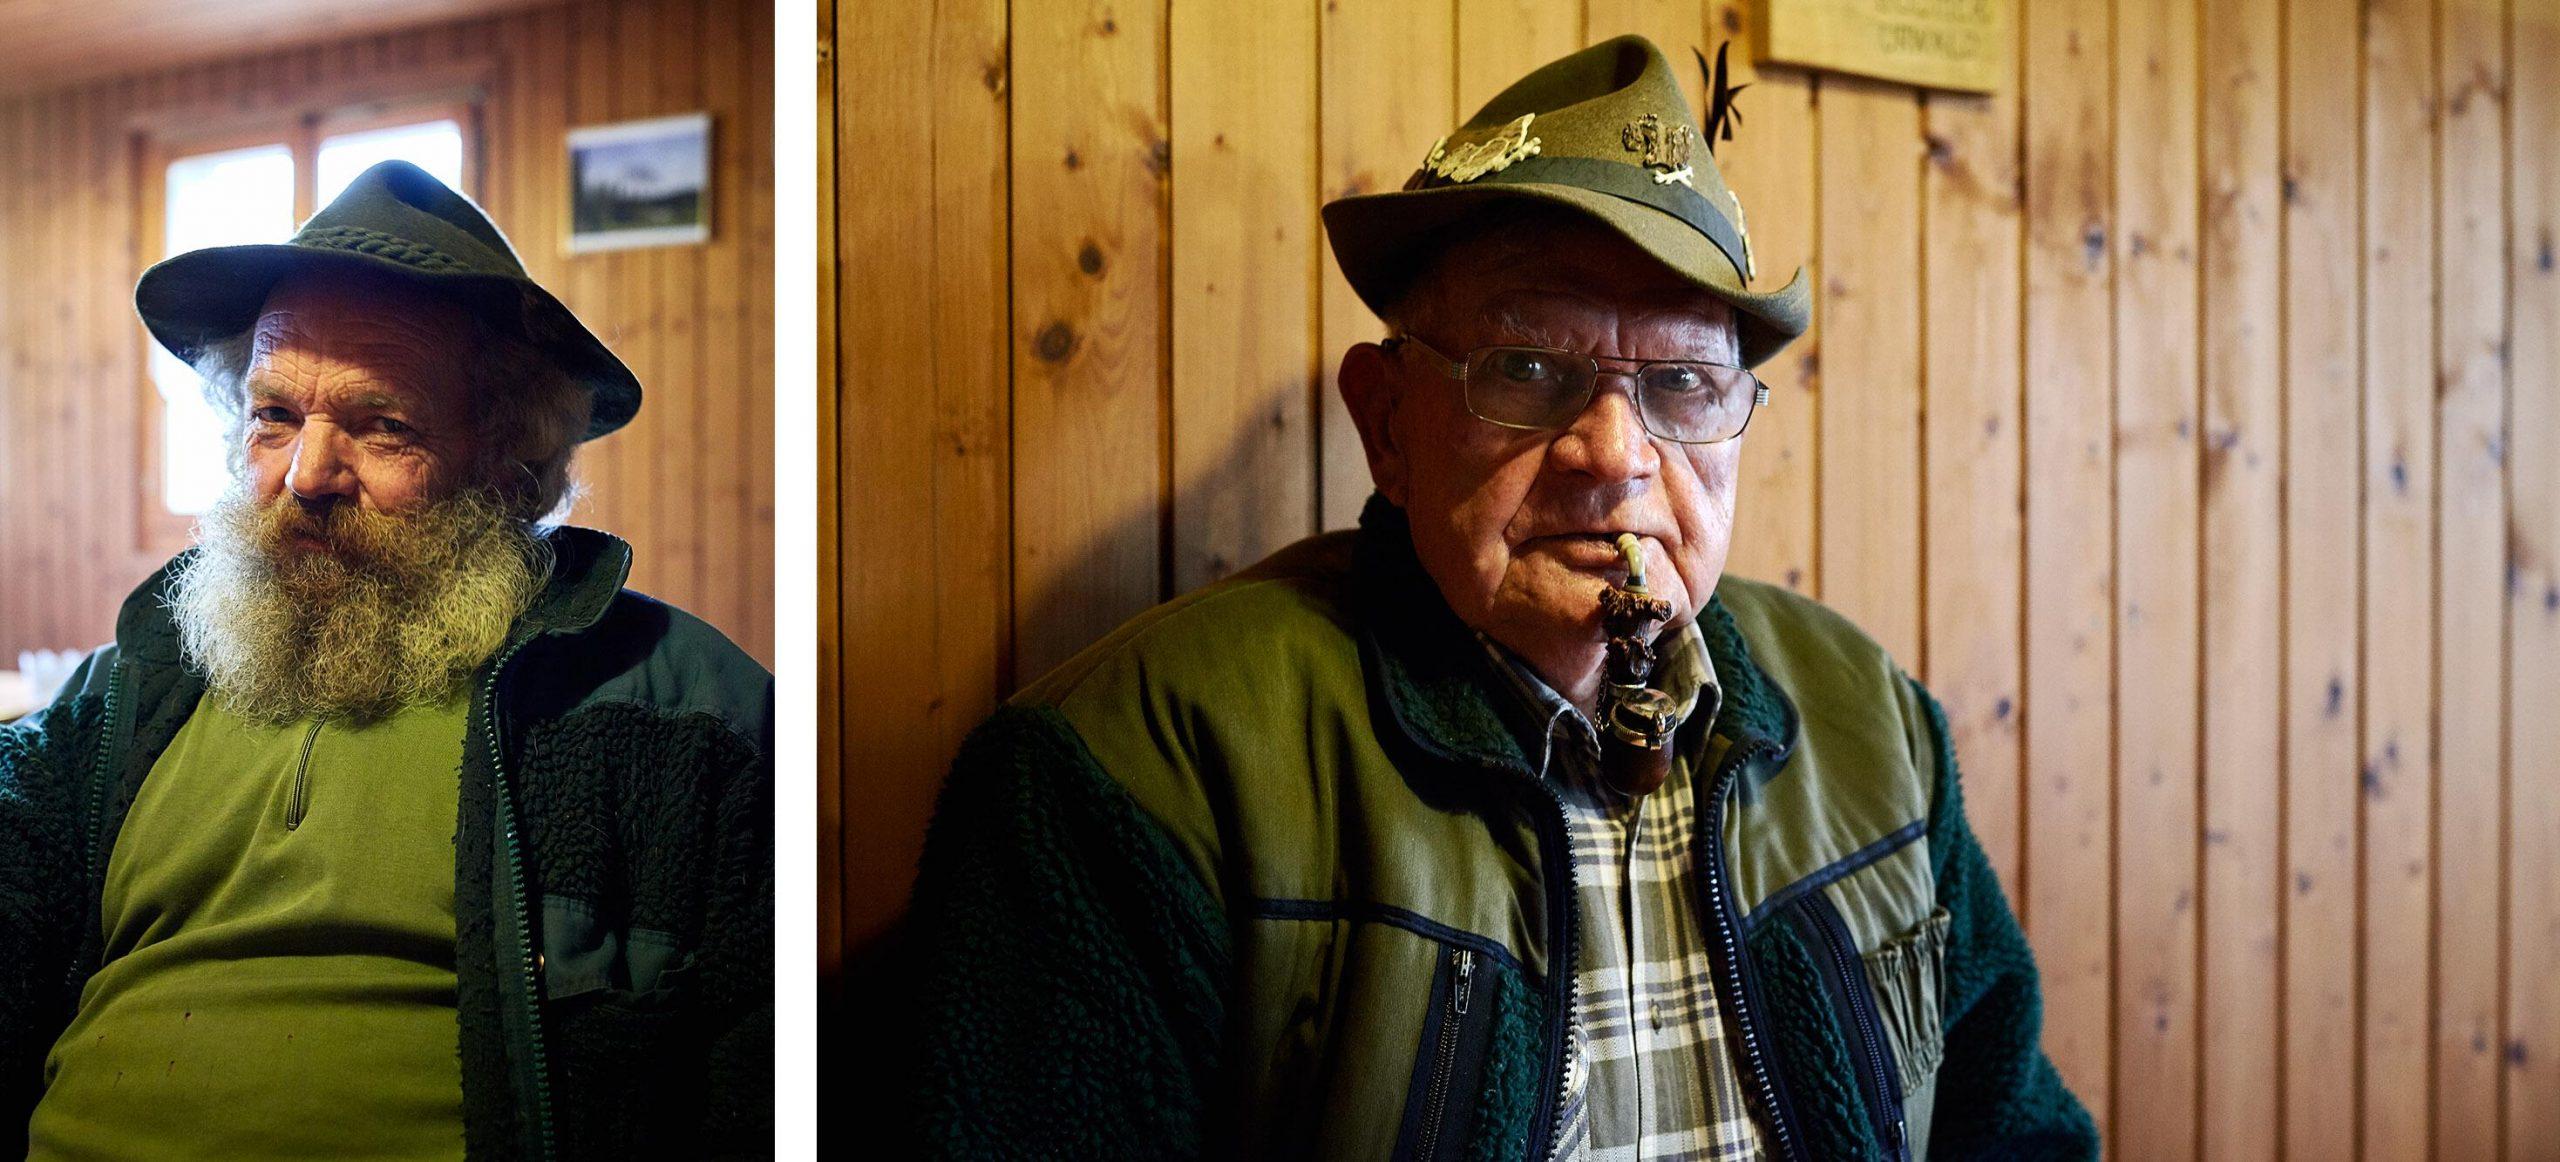 Florian-Lierzer-Bergwelten-Magazin-Schweiz-Editorial-Portrait-I